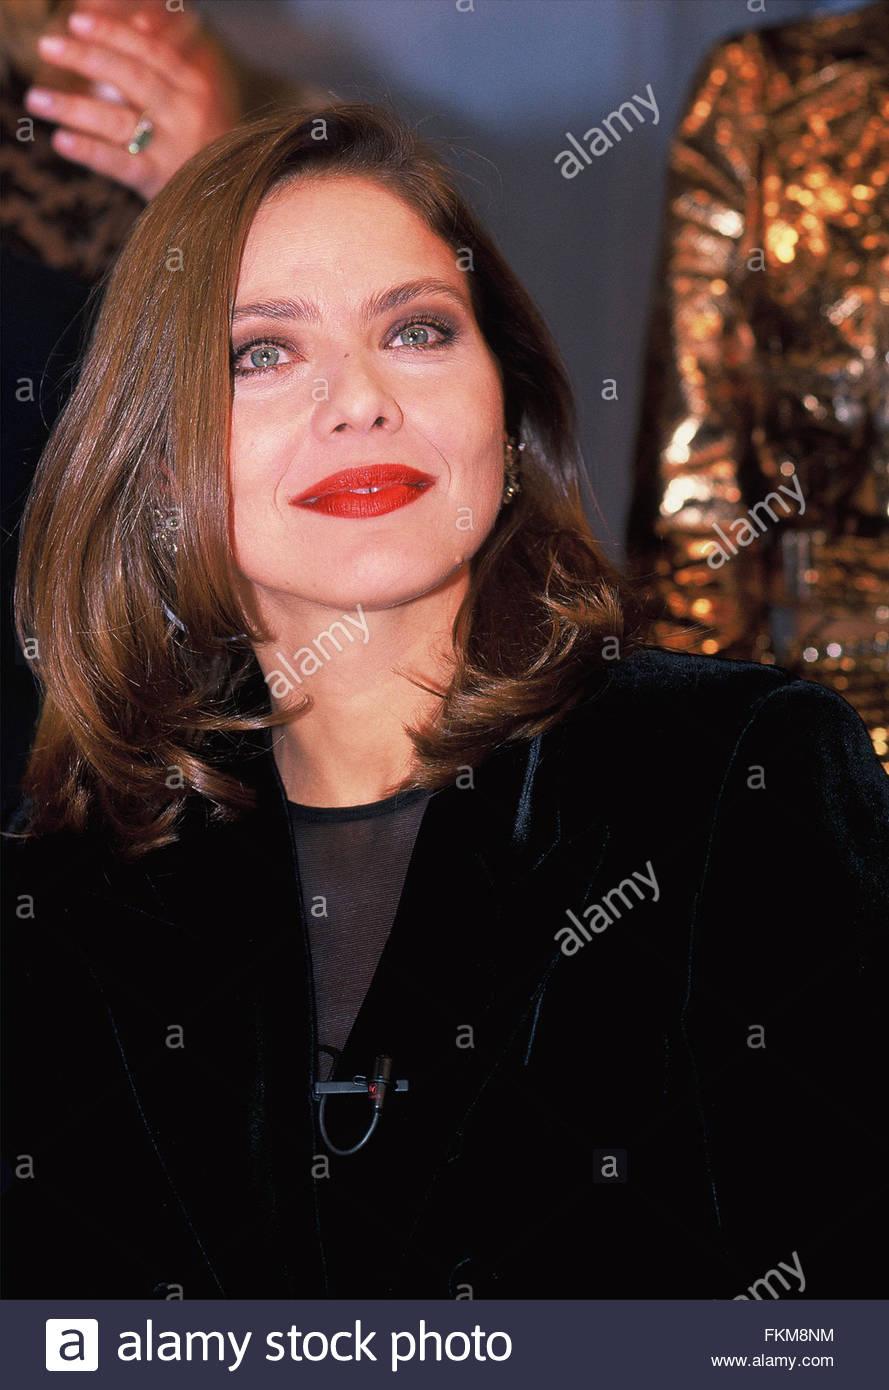 Italian actress Ornella Muti: biography, personal life, movies 49